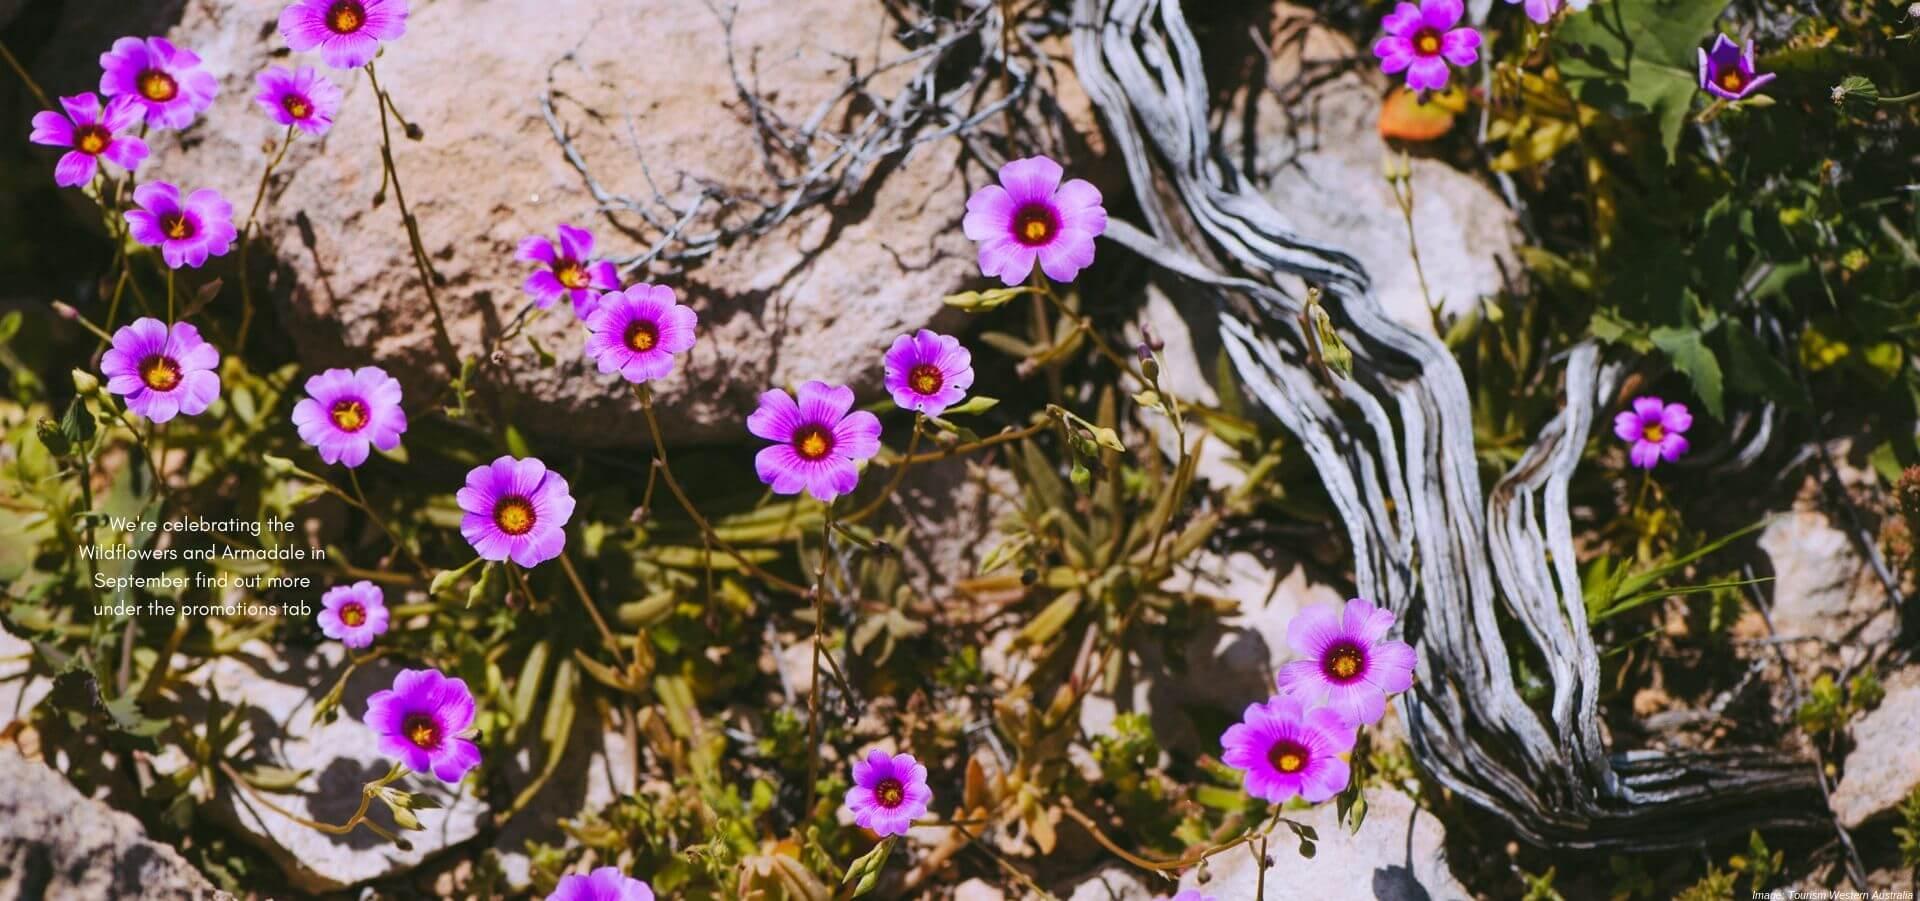 Wildflowers on Dirk Hartog Island